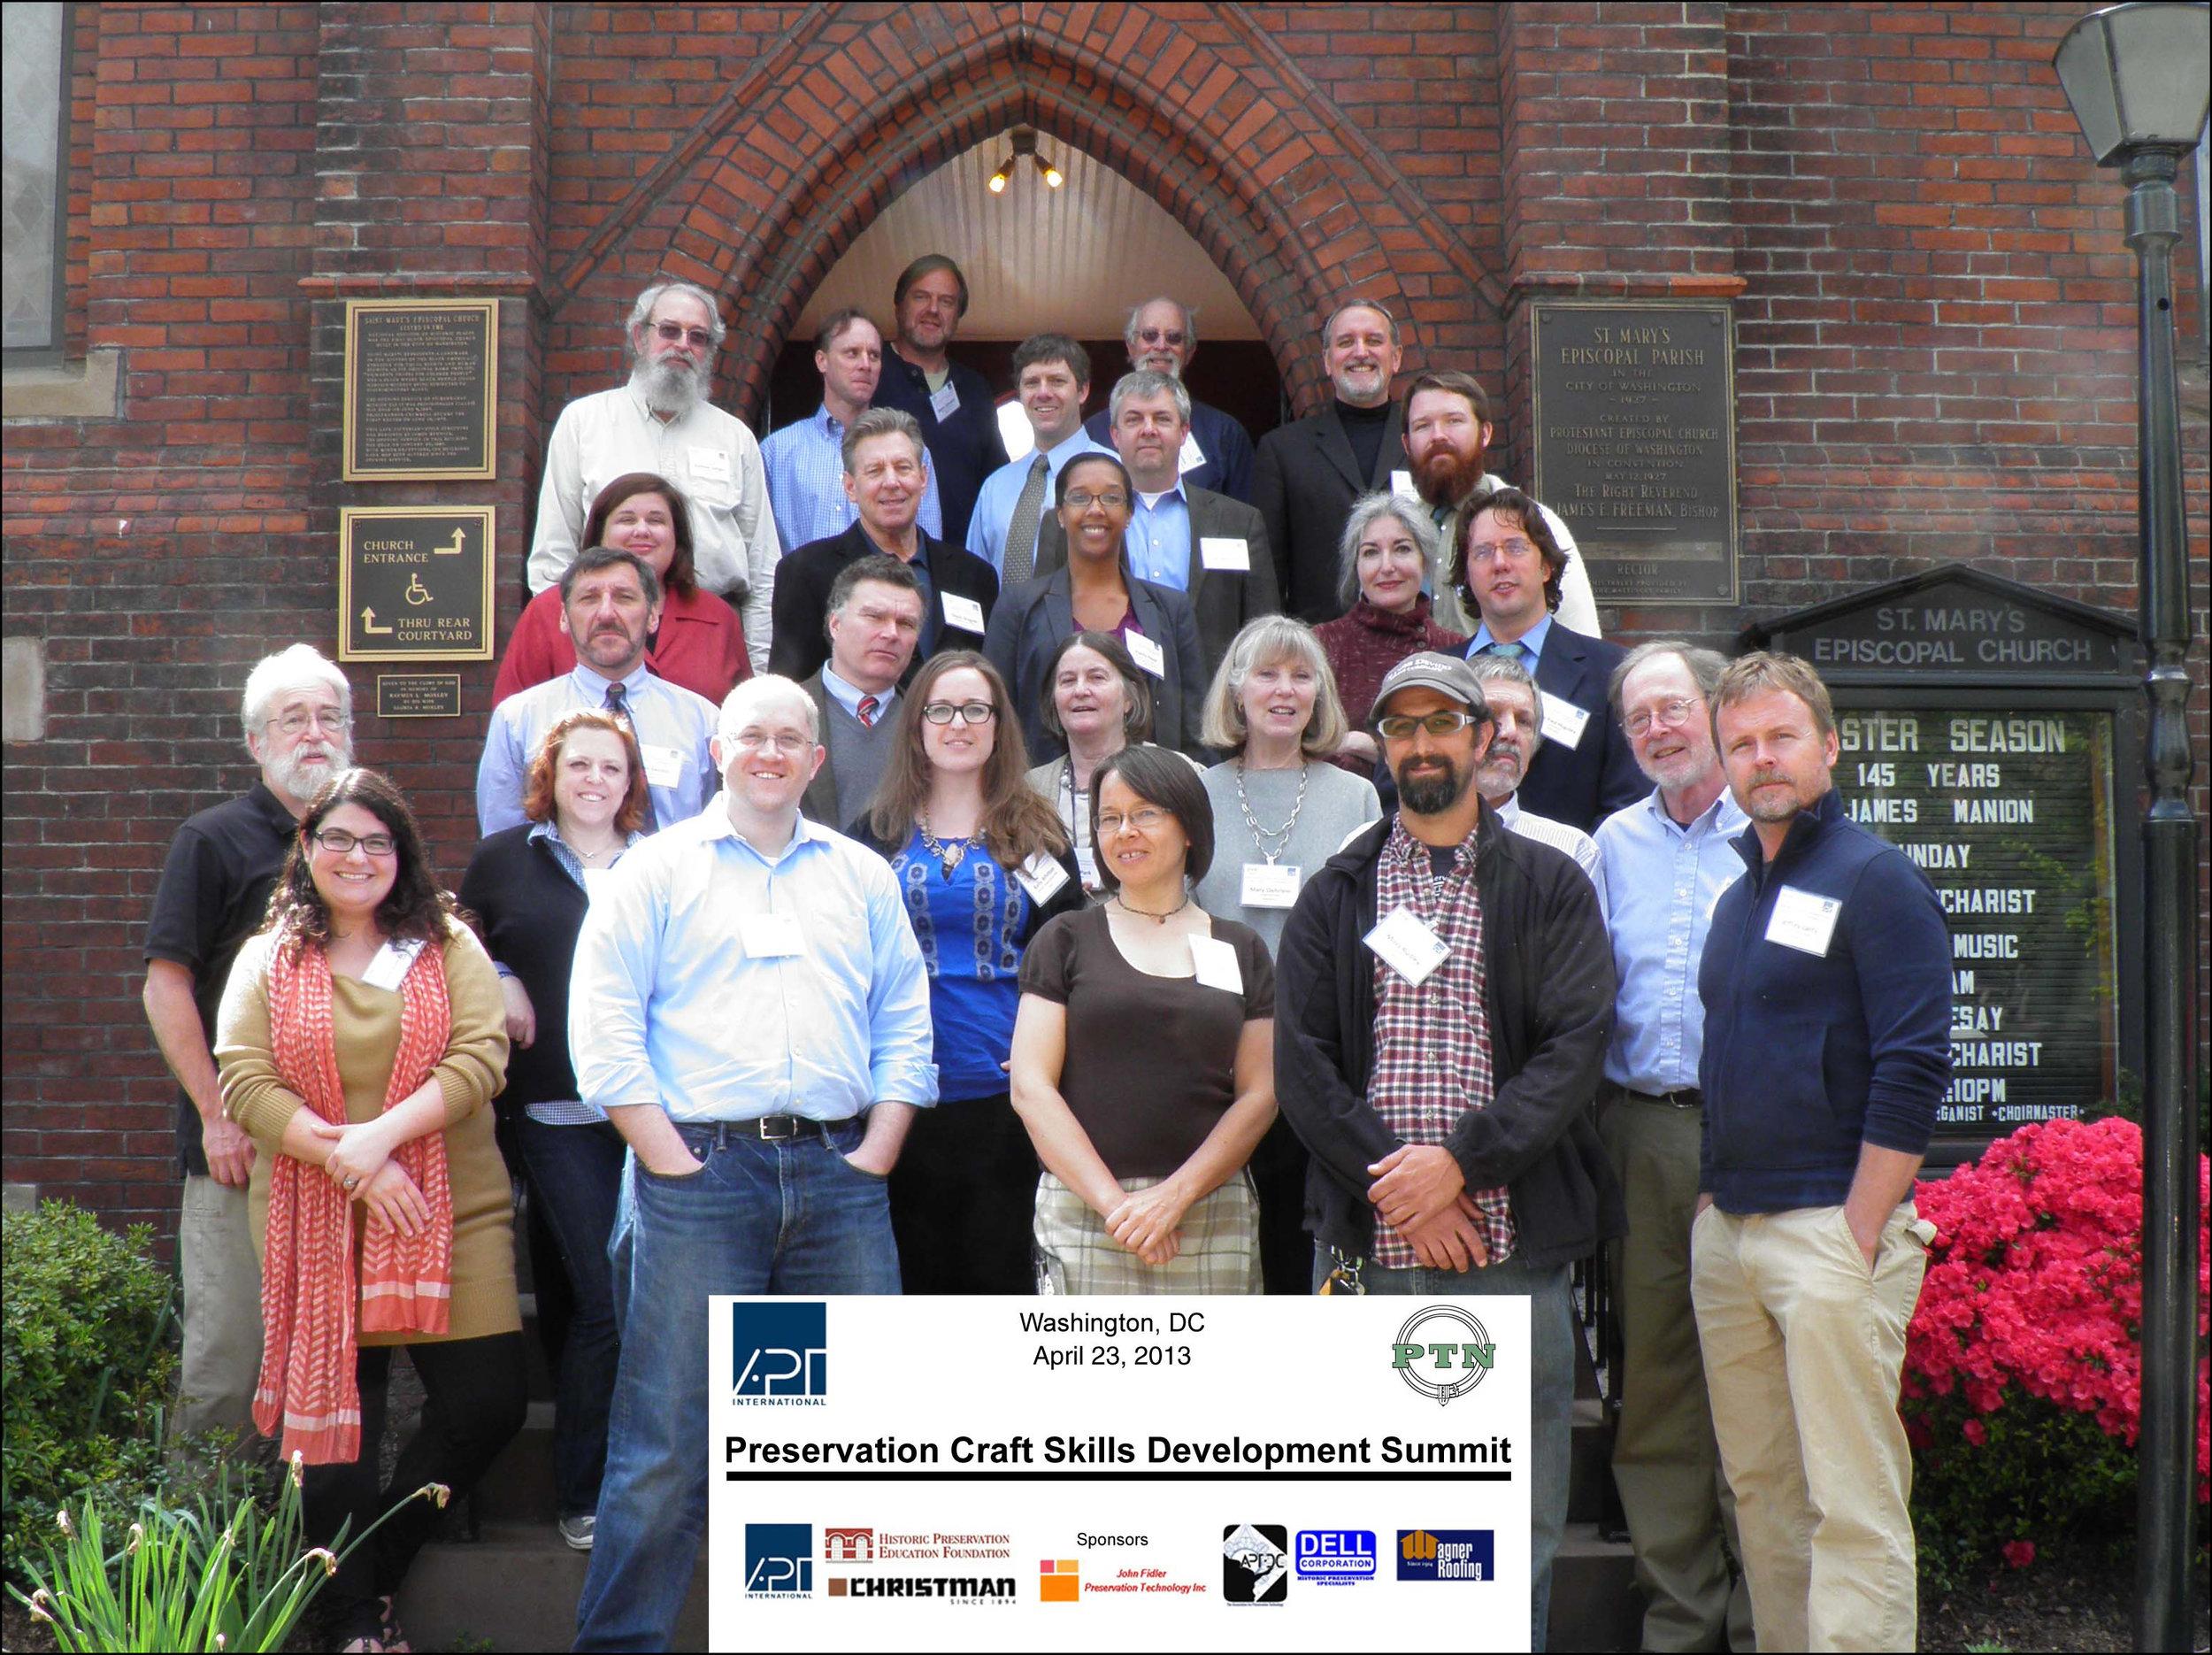 Delegates at the Preservation Craft Skills Summit.(Photo credit: © J. Bryan Blundell)